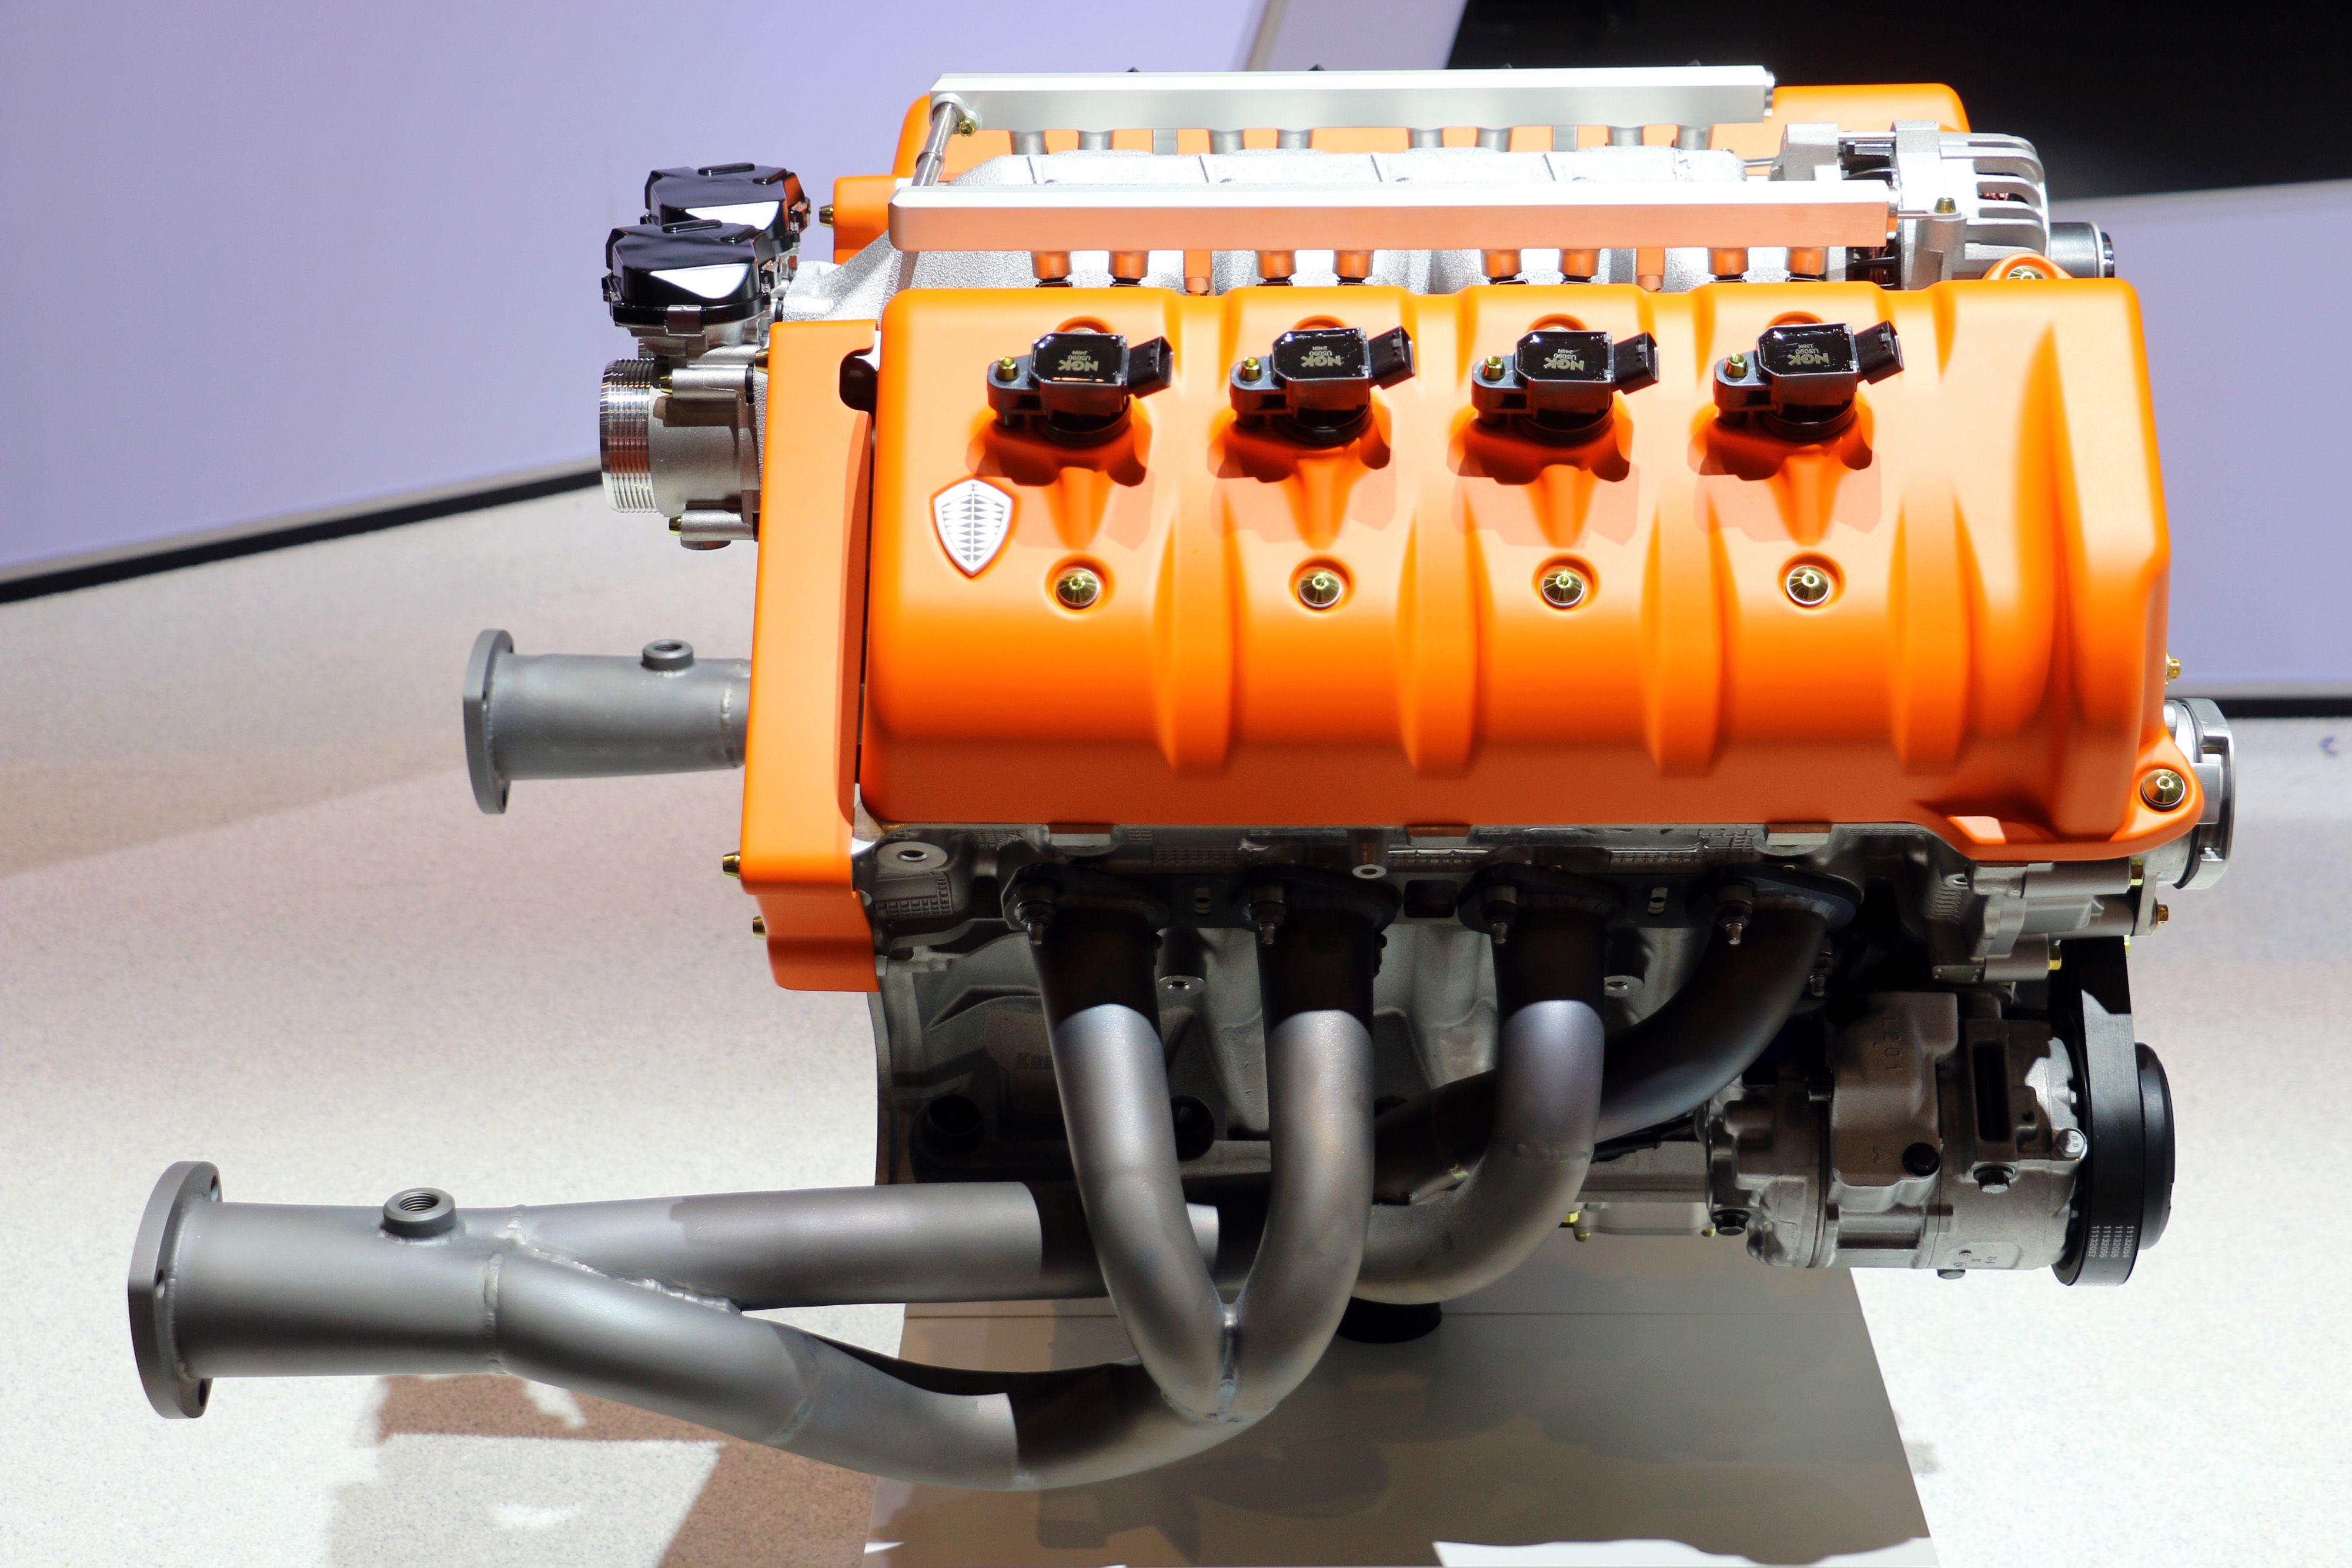 How Koenigsegg Made a Better Ford V-8